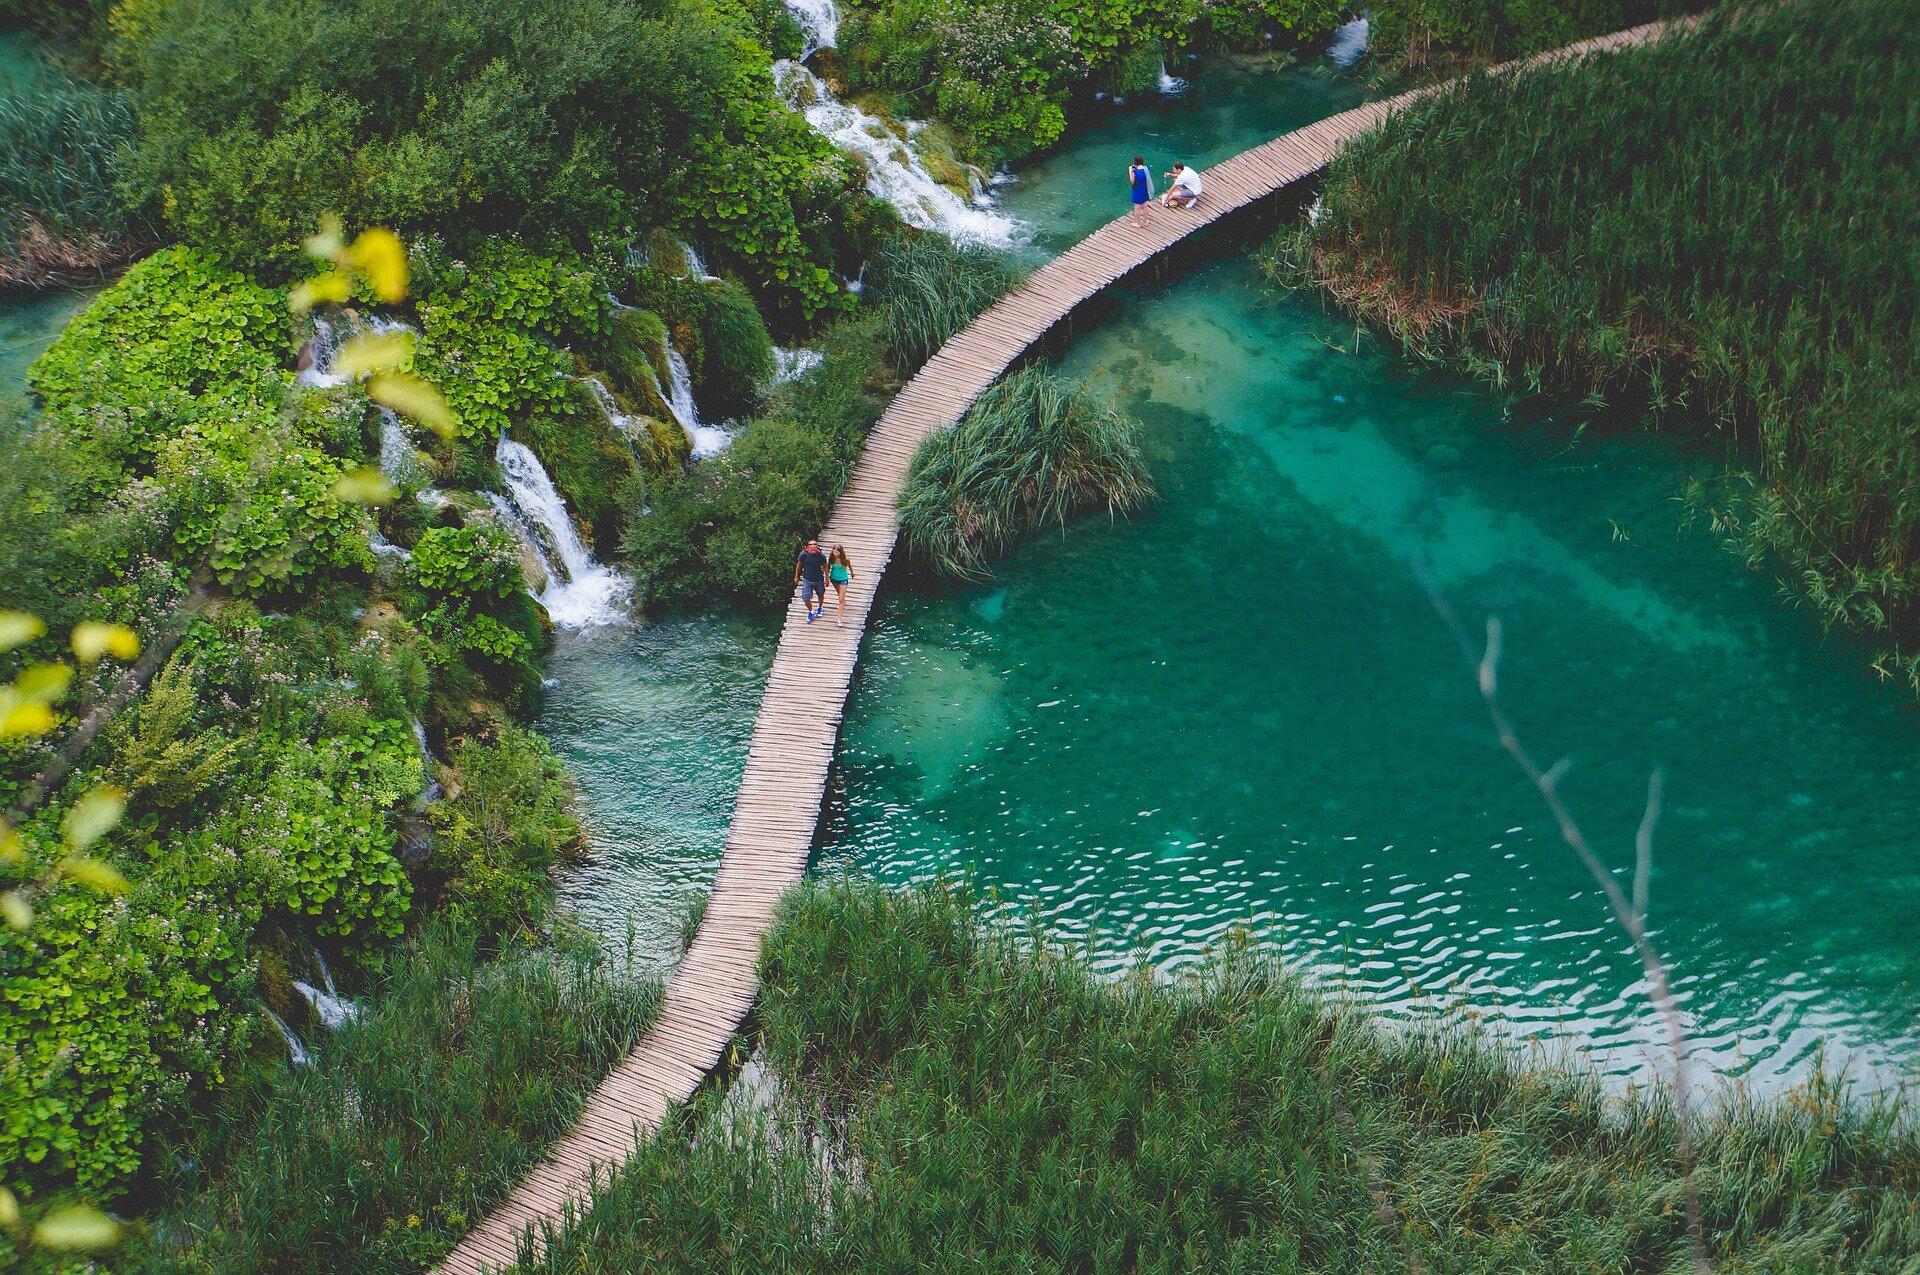 Пляжи, замки и озера: сезон отдыха в Хорватии начался с большими скидками на путевки